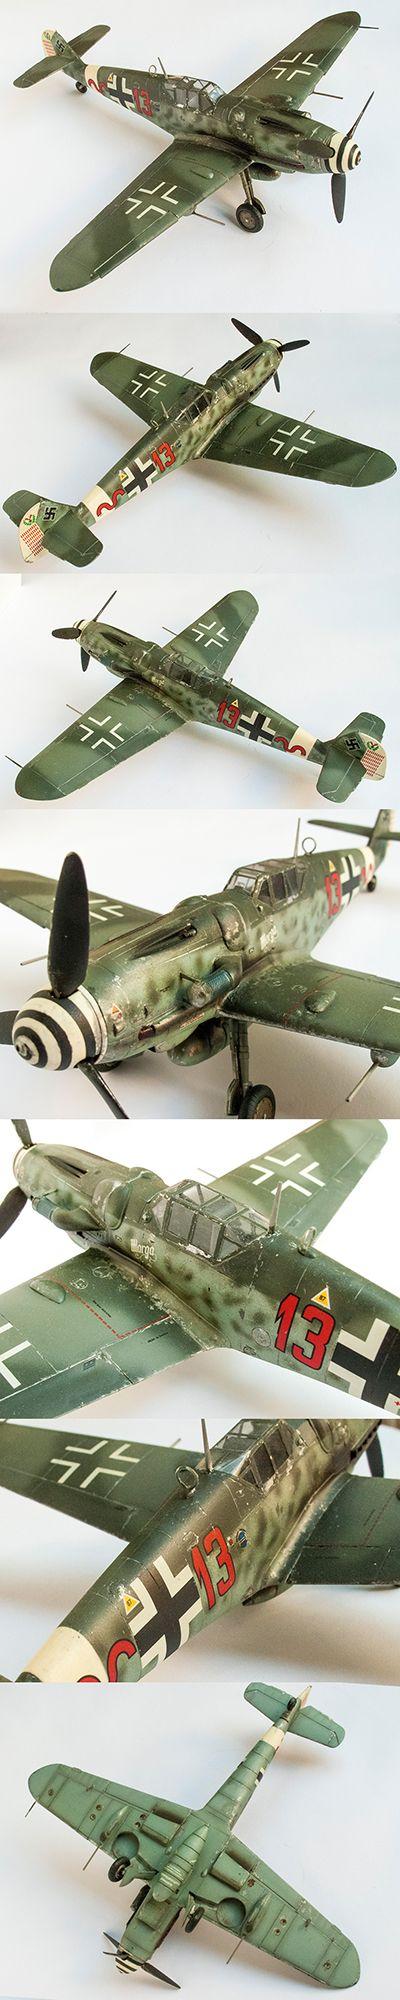 Messerschitt Bf 109, 1/48 scale by Korhan AKBAYTOGAN